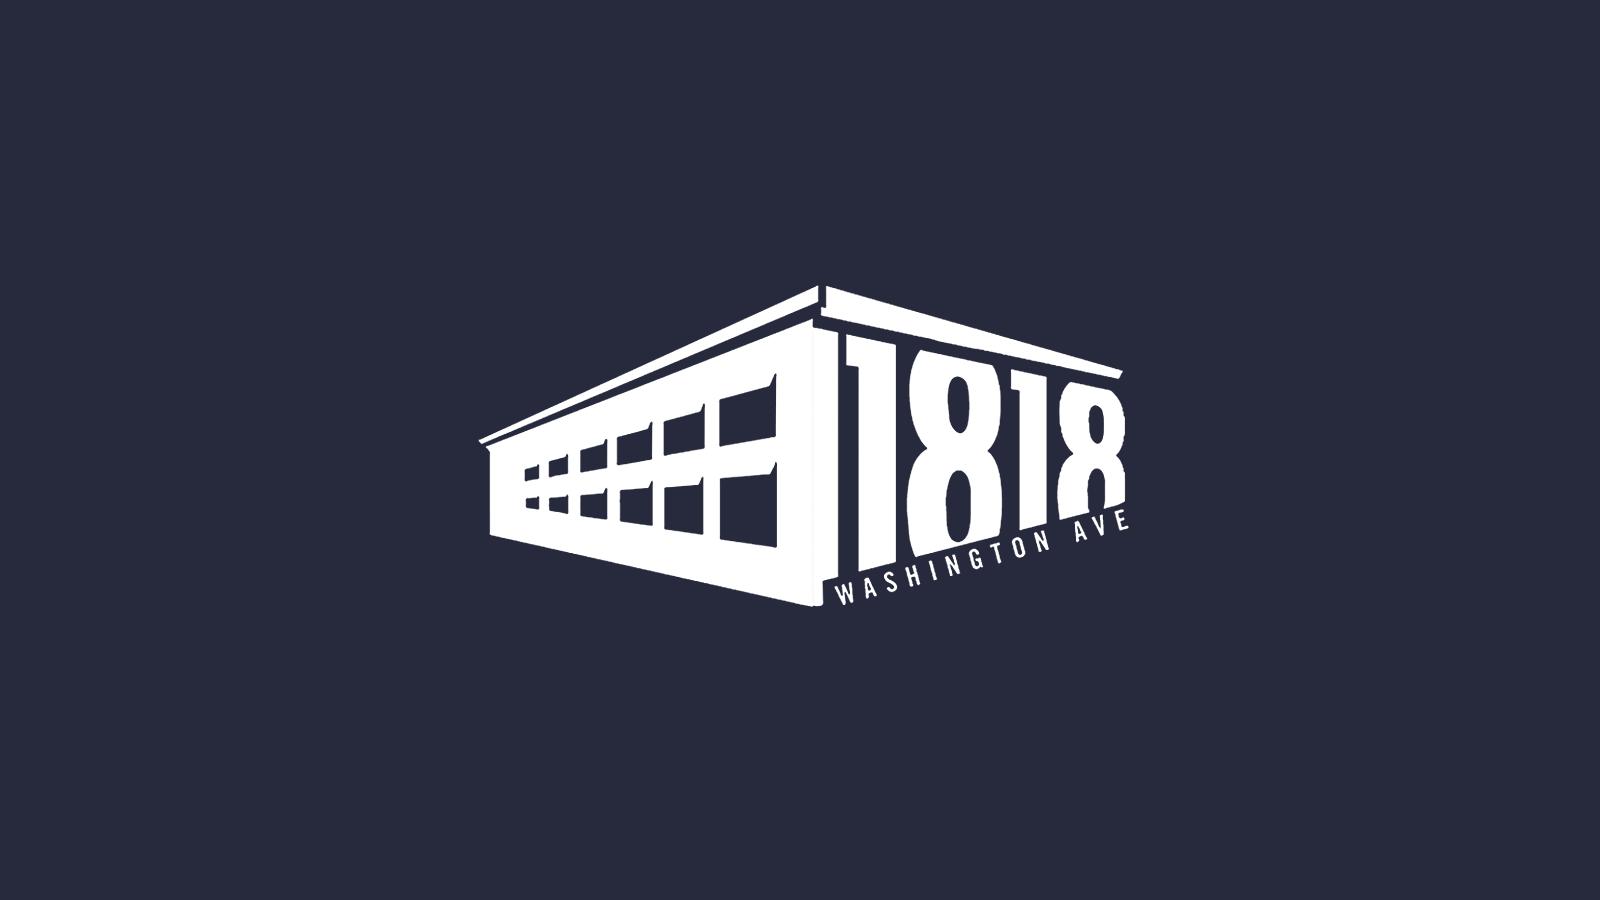 1818 Washington Avenue Saint Louis Logo